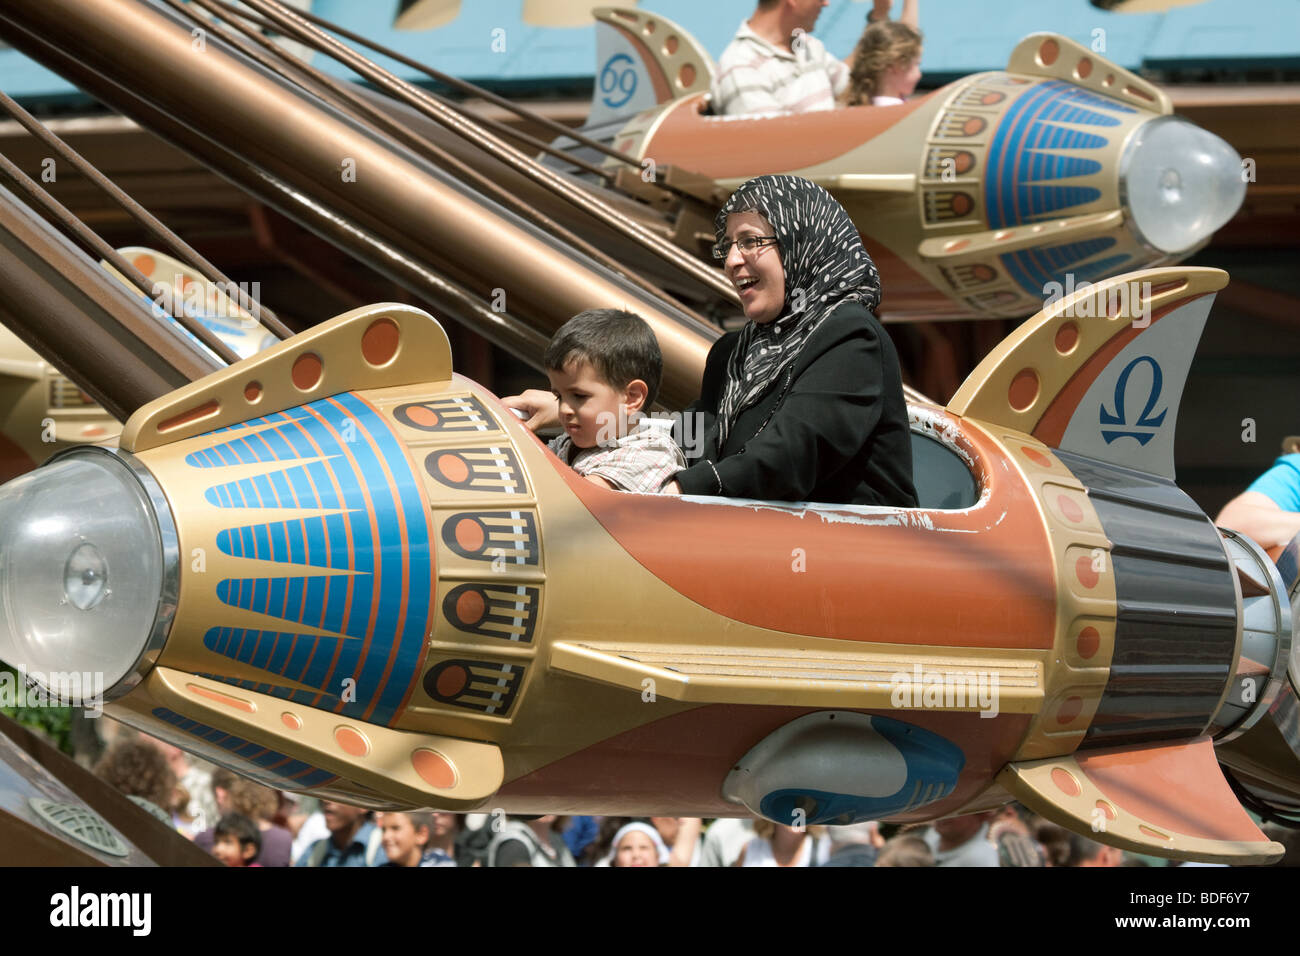 A family enjoys a ride on a rocket roundabout, disneyland paris France - Stock Image